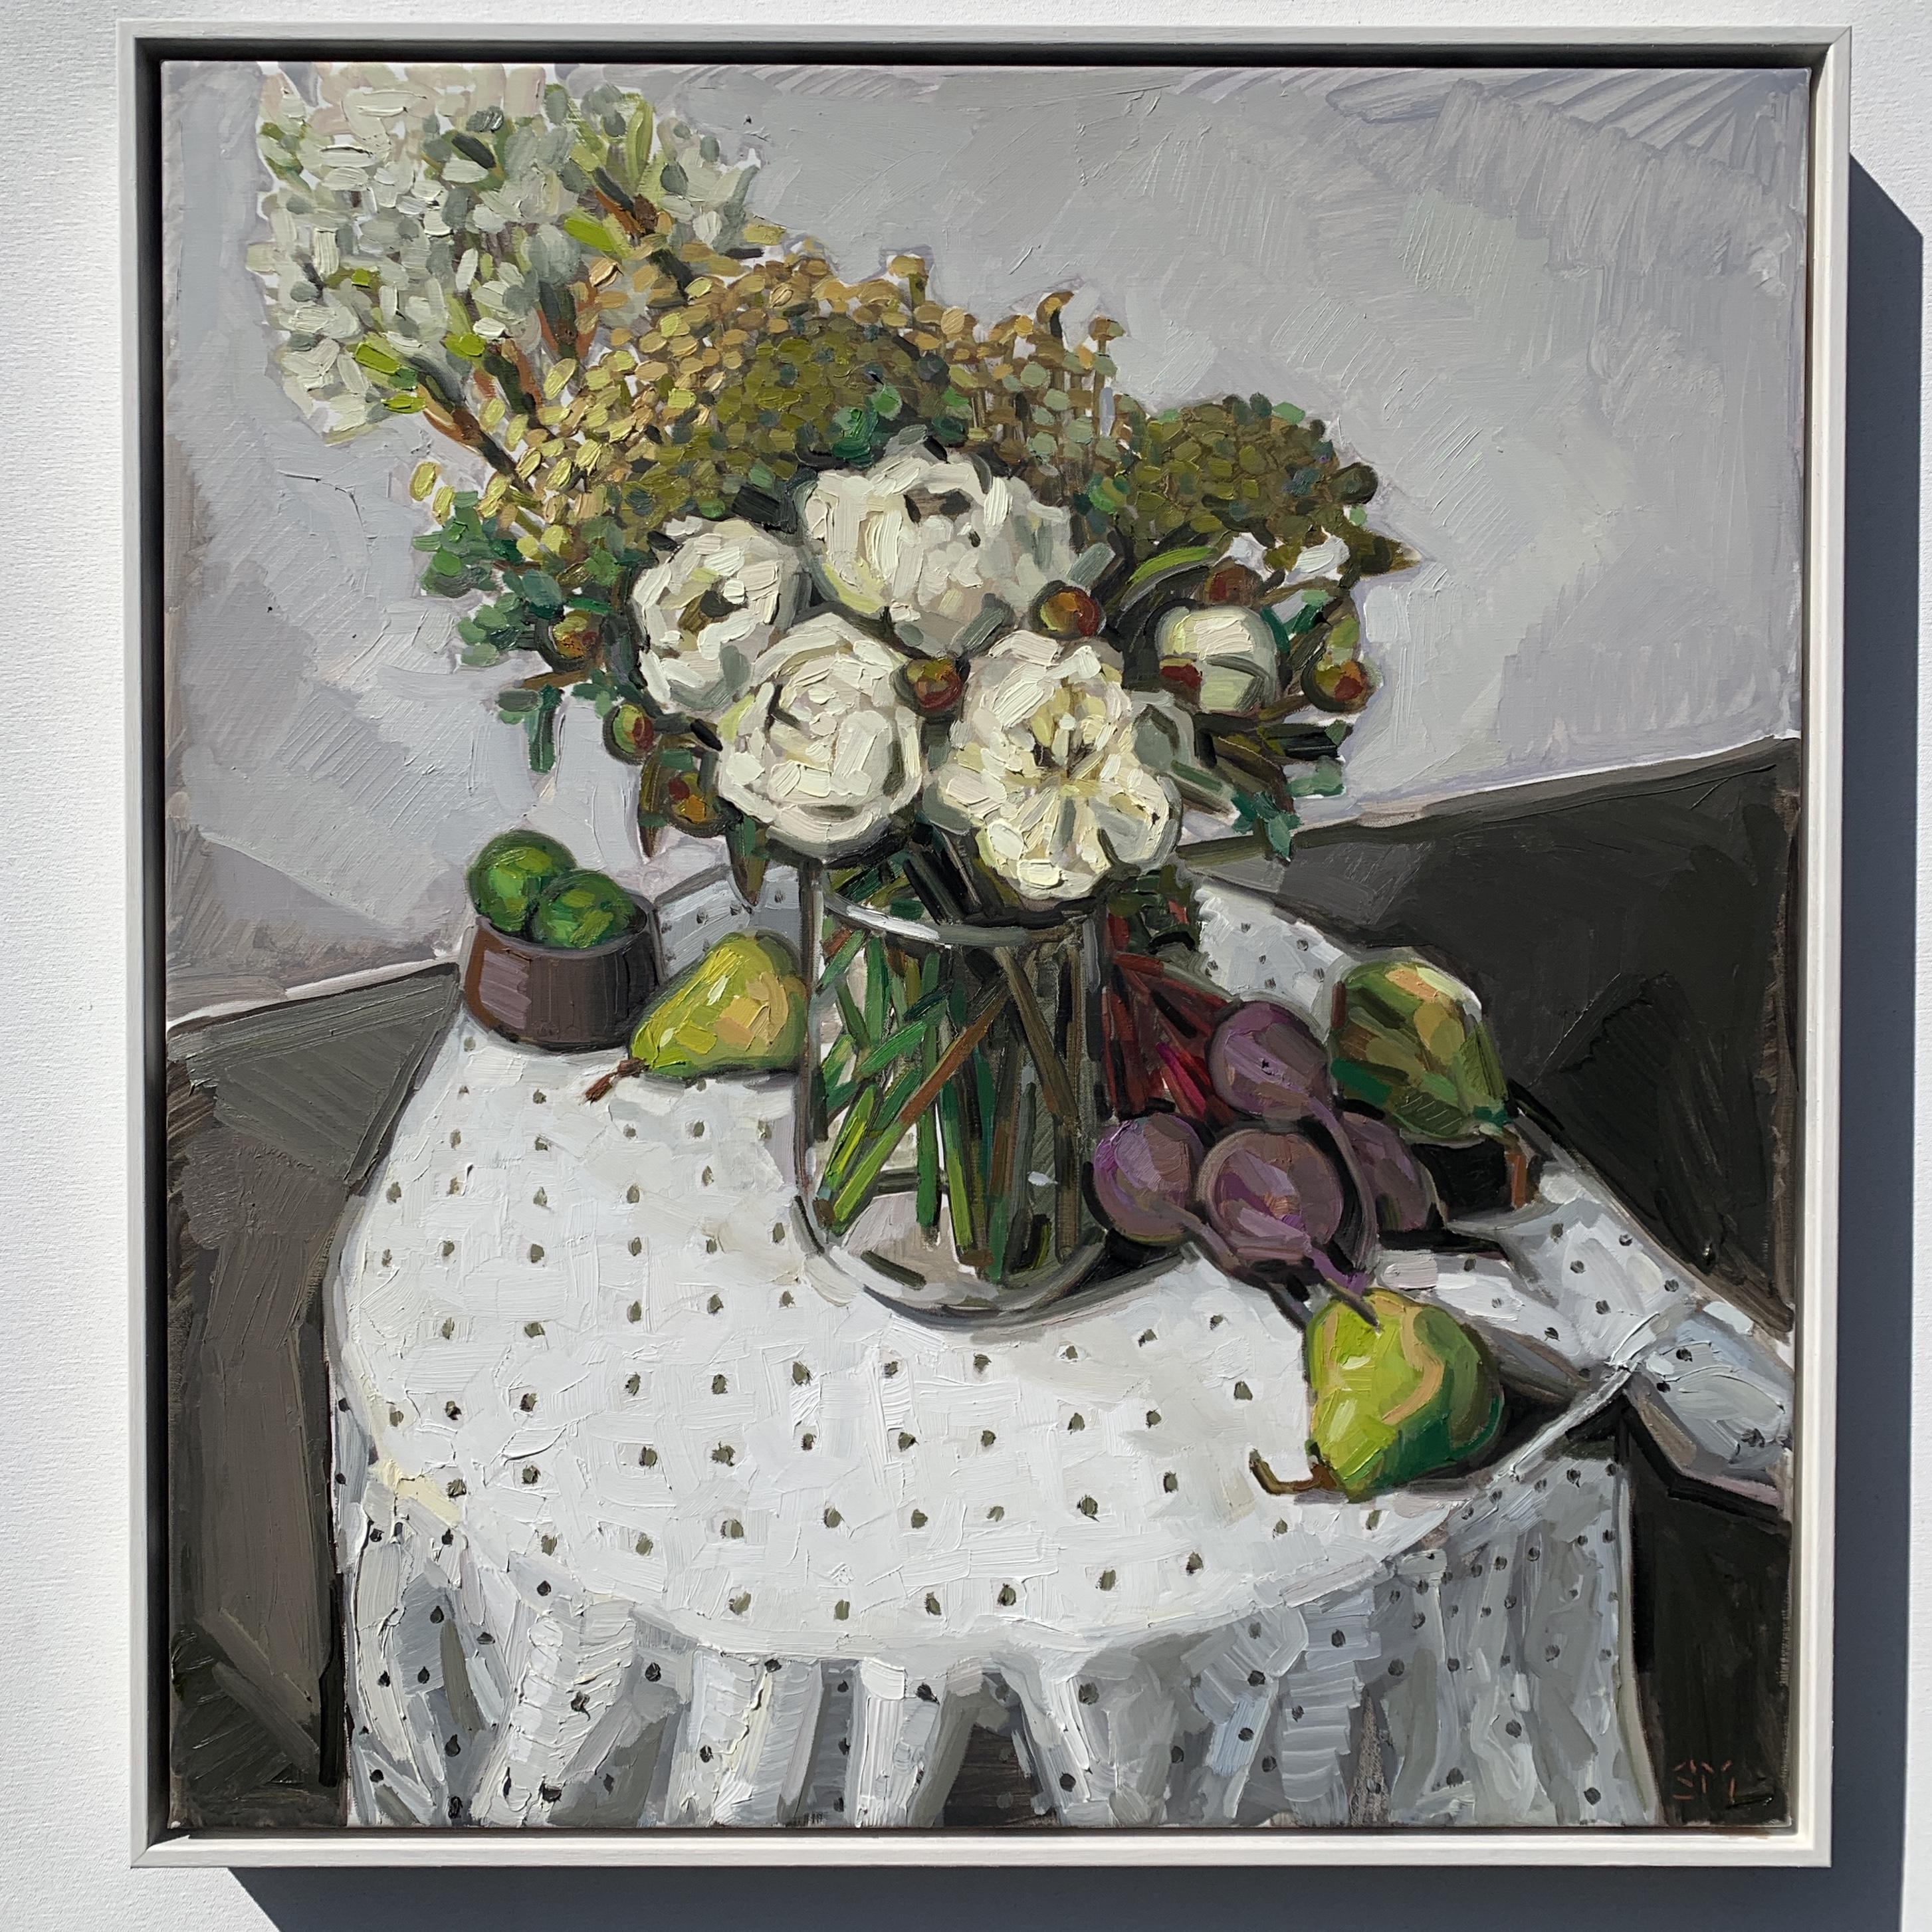 sam michelle 'peony bouquet' 69x64cm 202